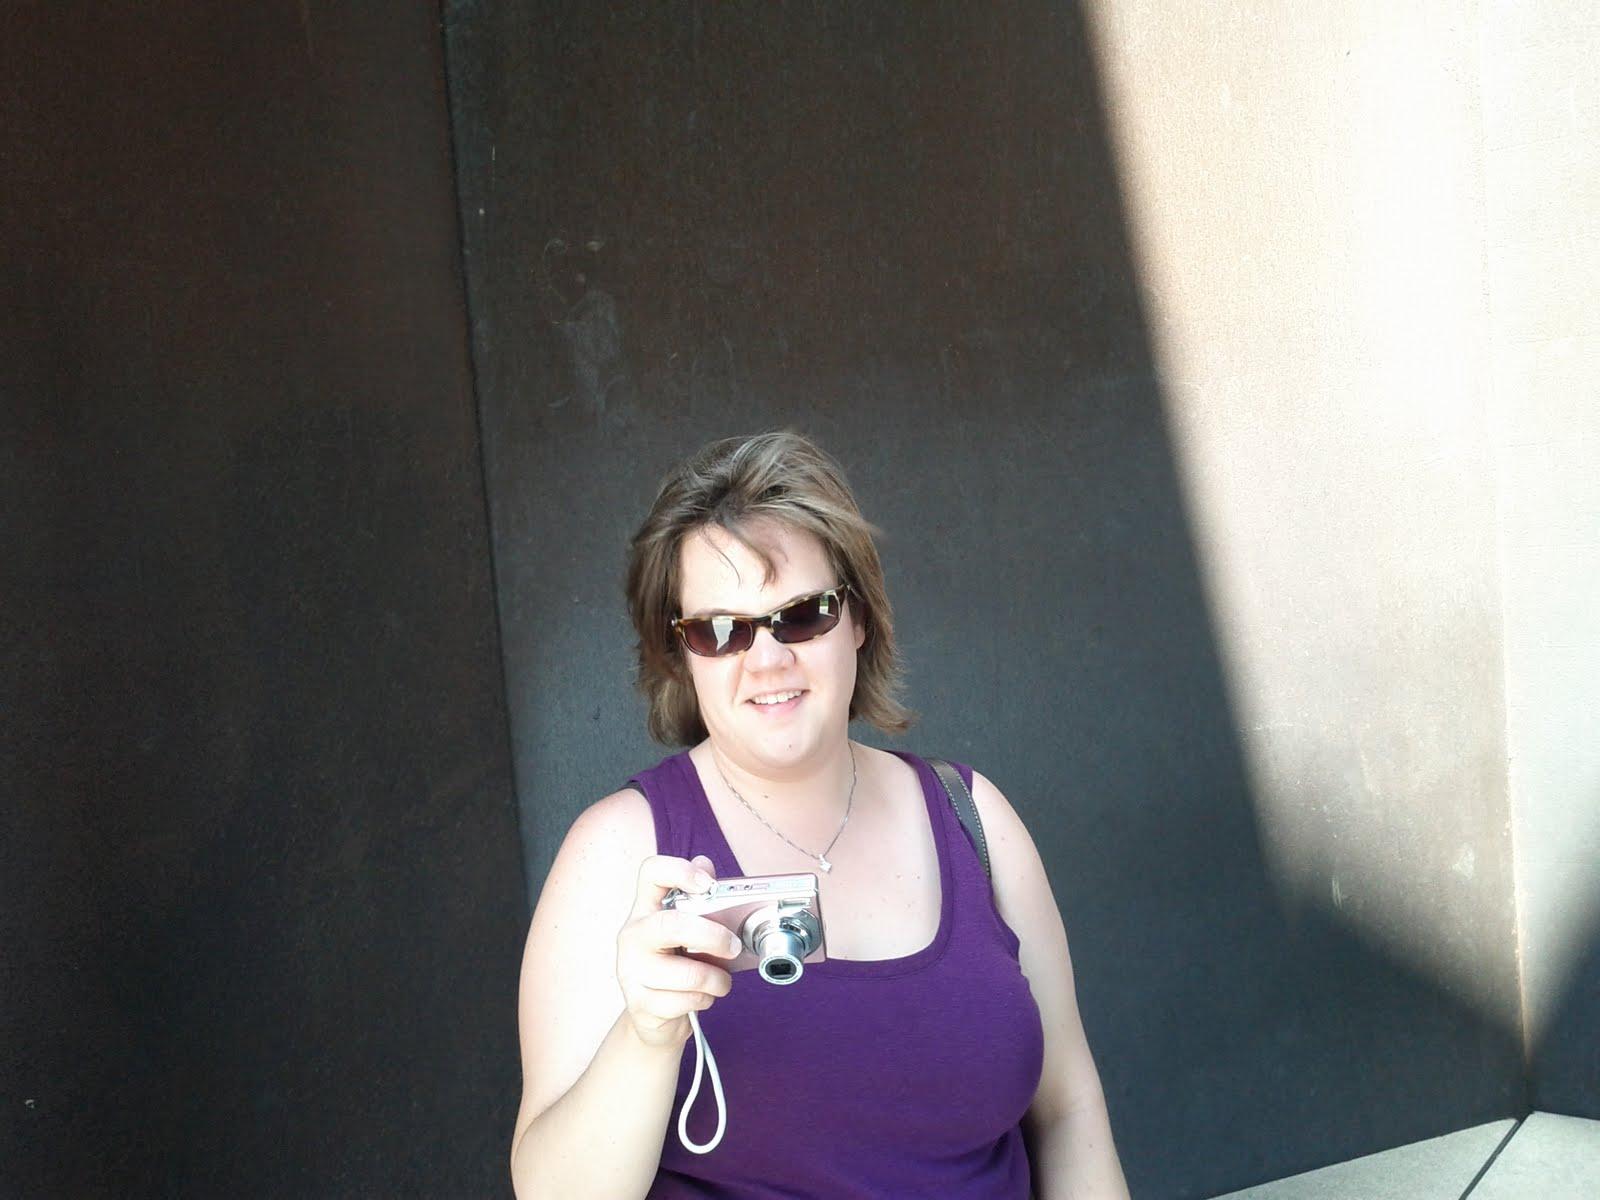 Dallas Fort Worth vacation - IMG_20110611_124927.jpg